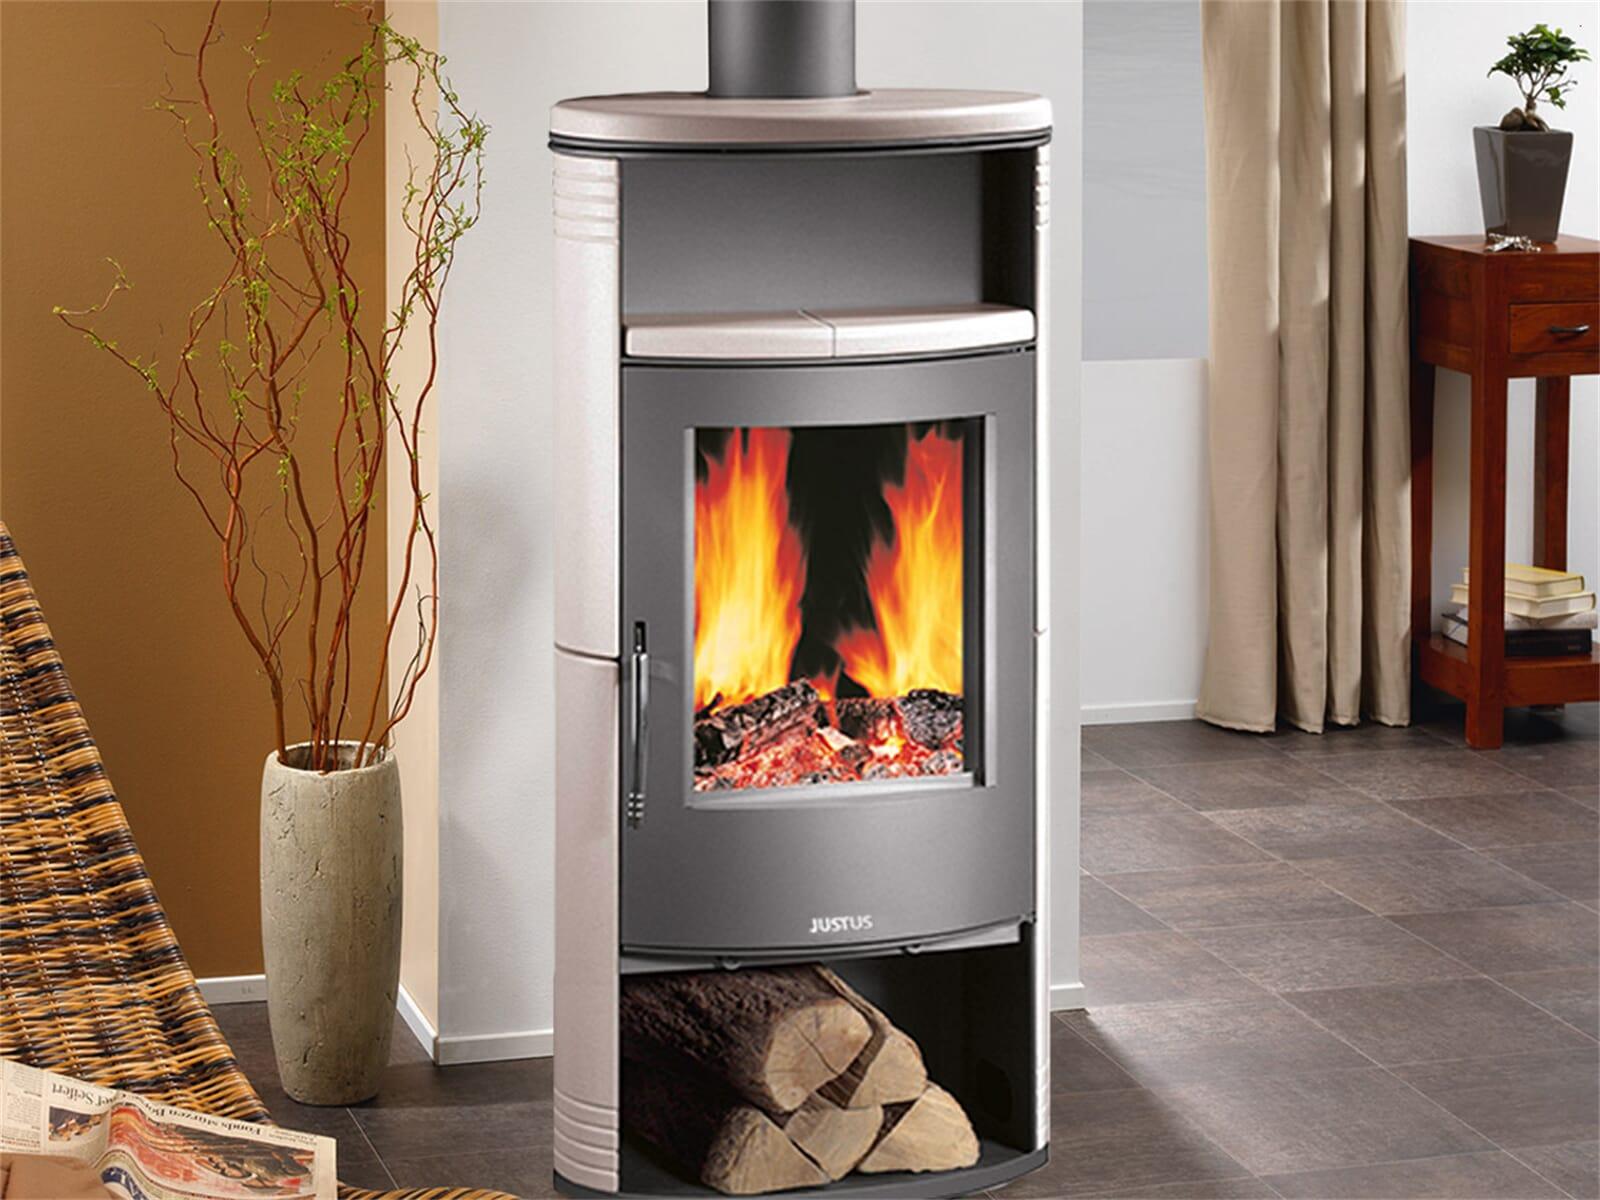 justus island 5 4875 25 kaminofen keramik ahorn wei f r 1174 90 eur. Black Bedroom Furniture Sets. Home Design Ideas